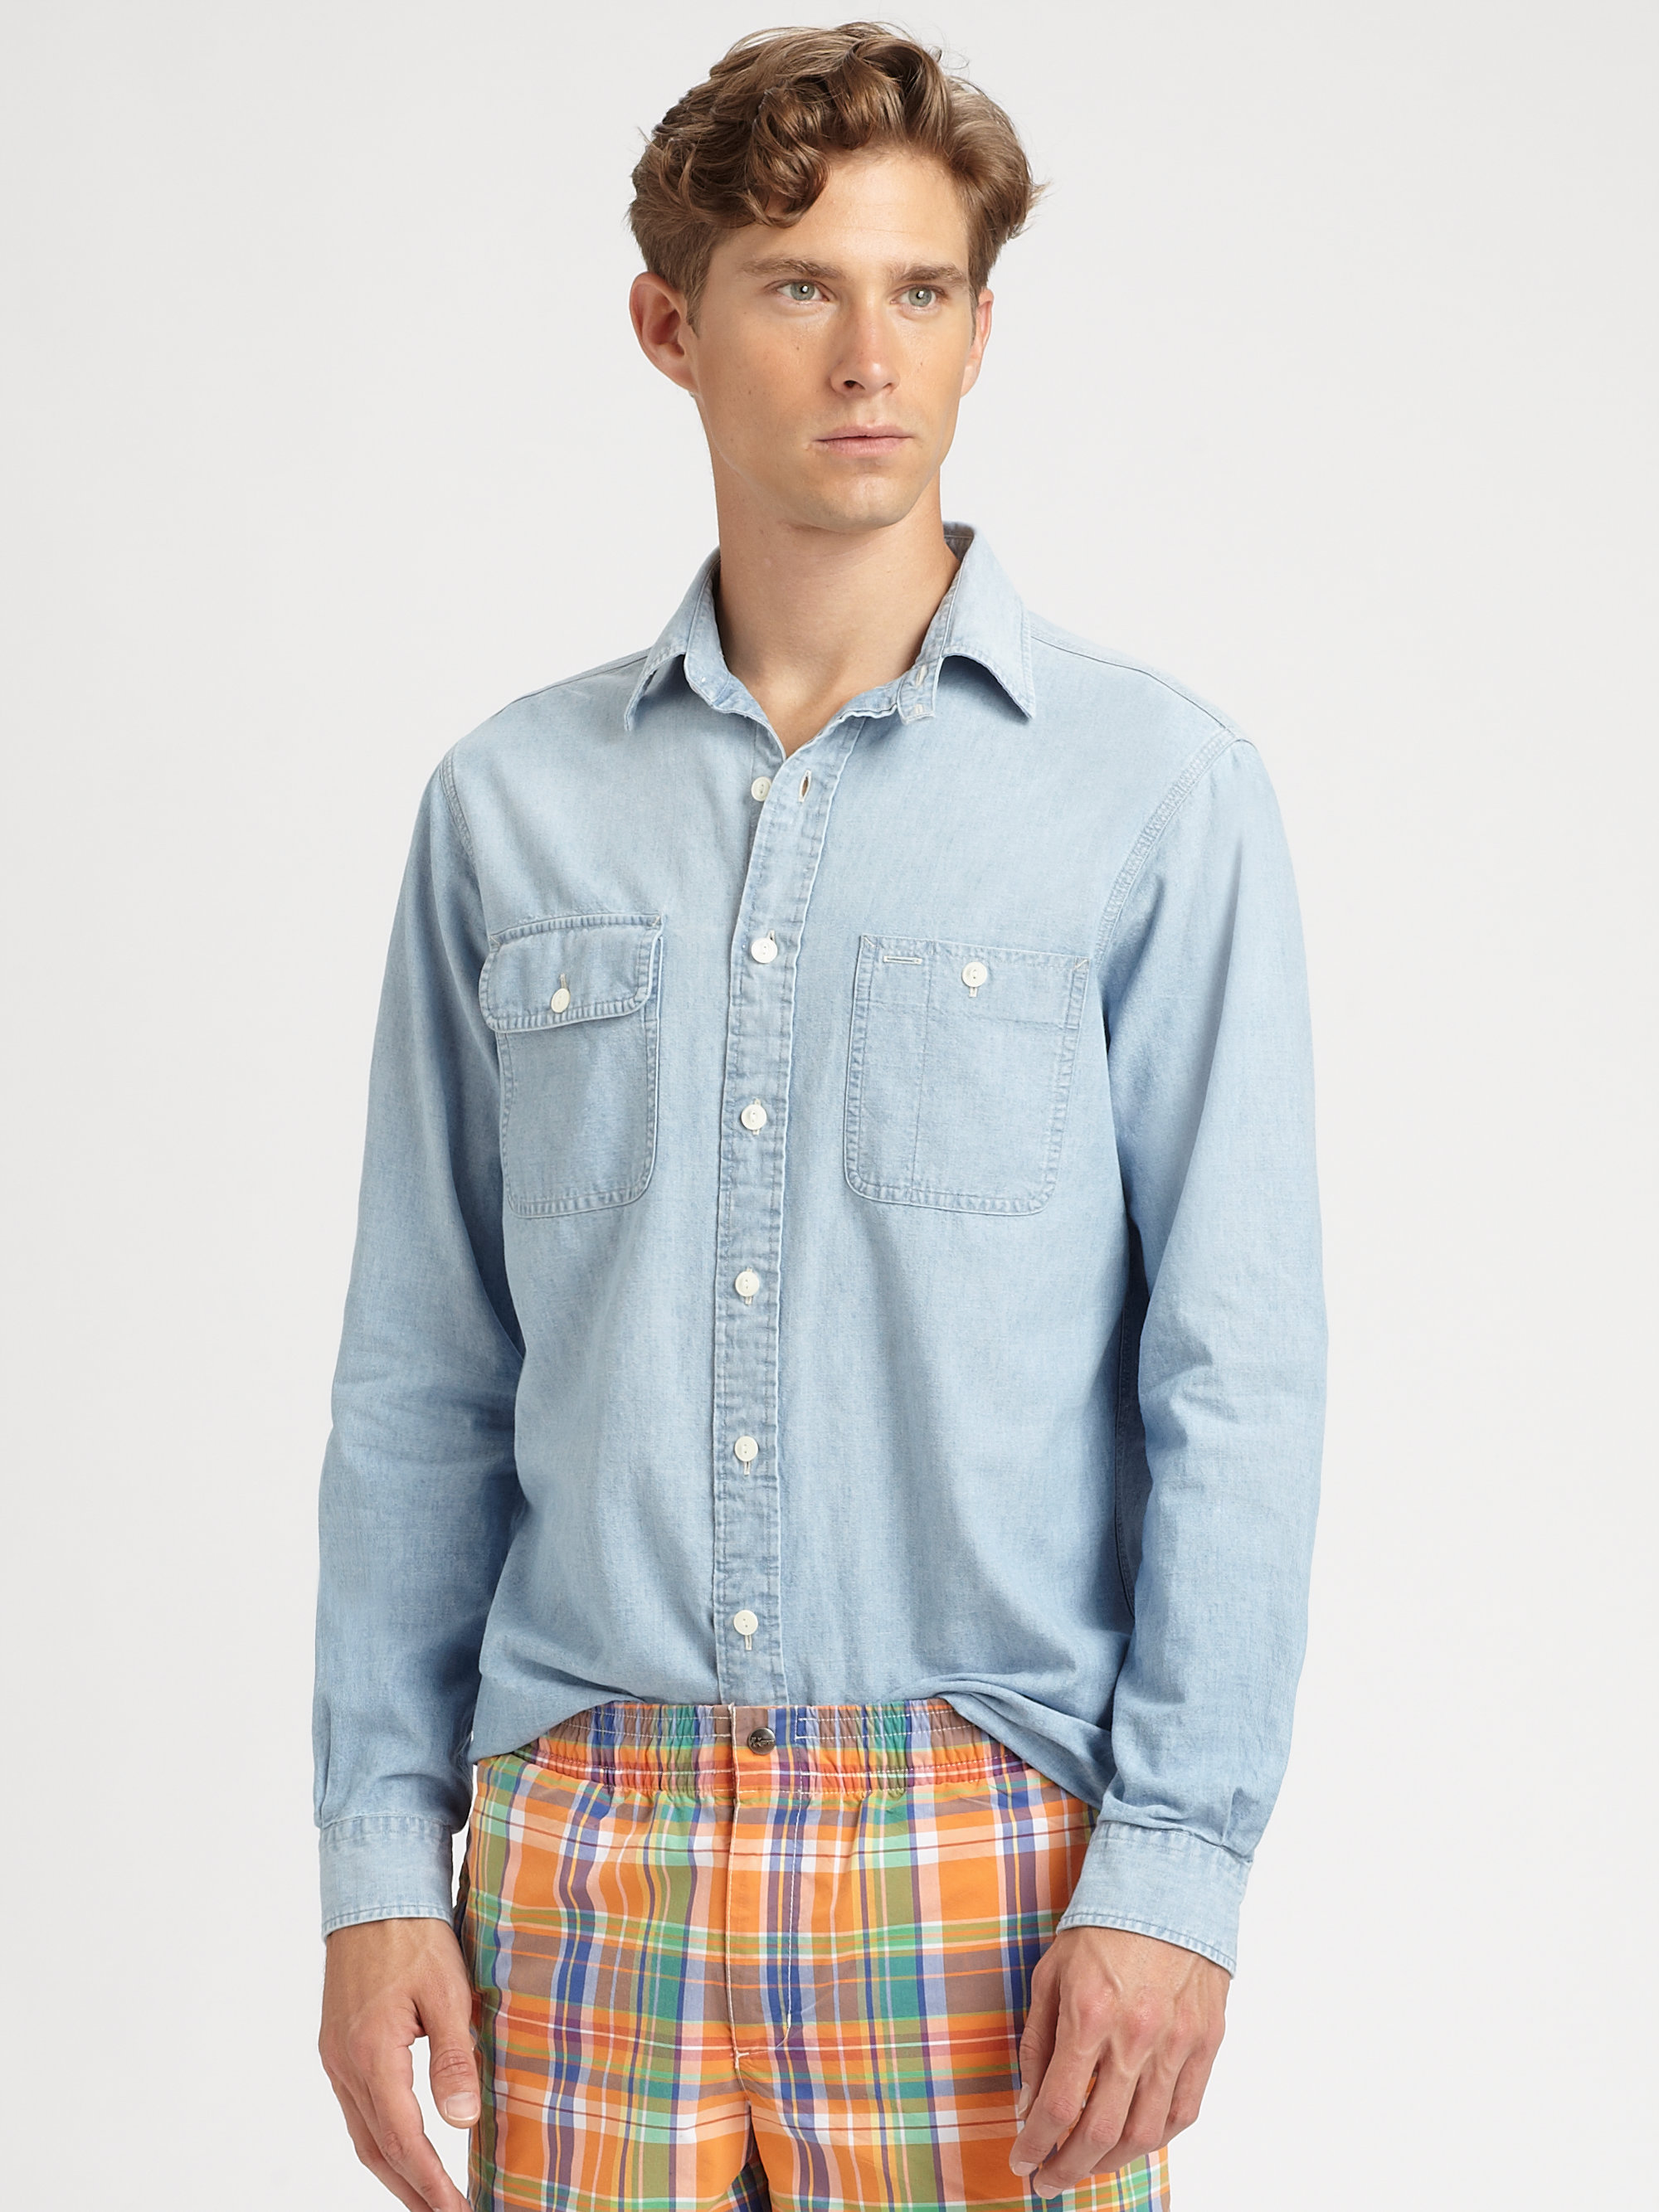 Polo Ralph Lauren Customfit Denim Chambray Shirt In Blue